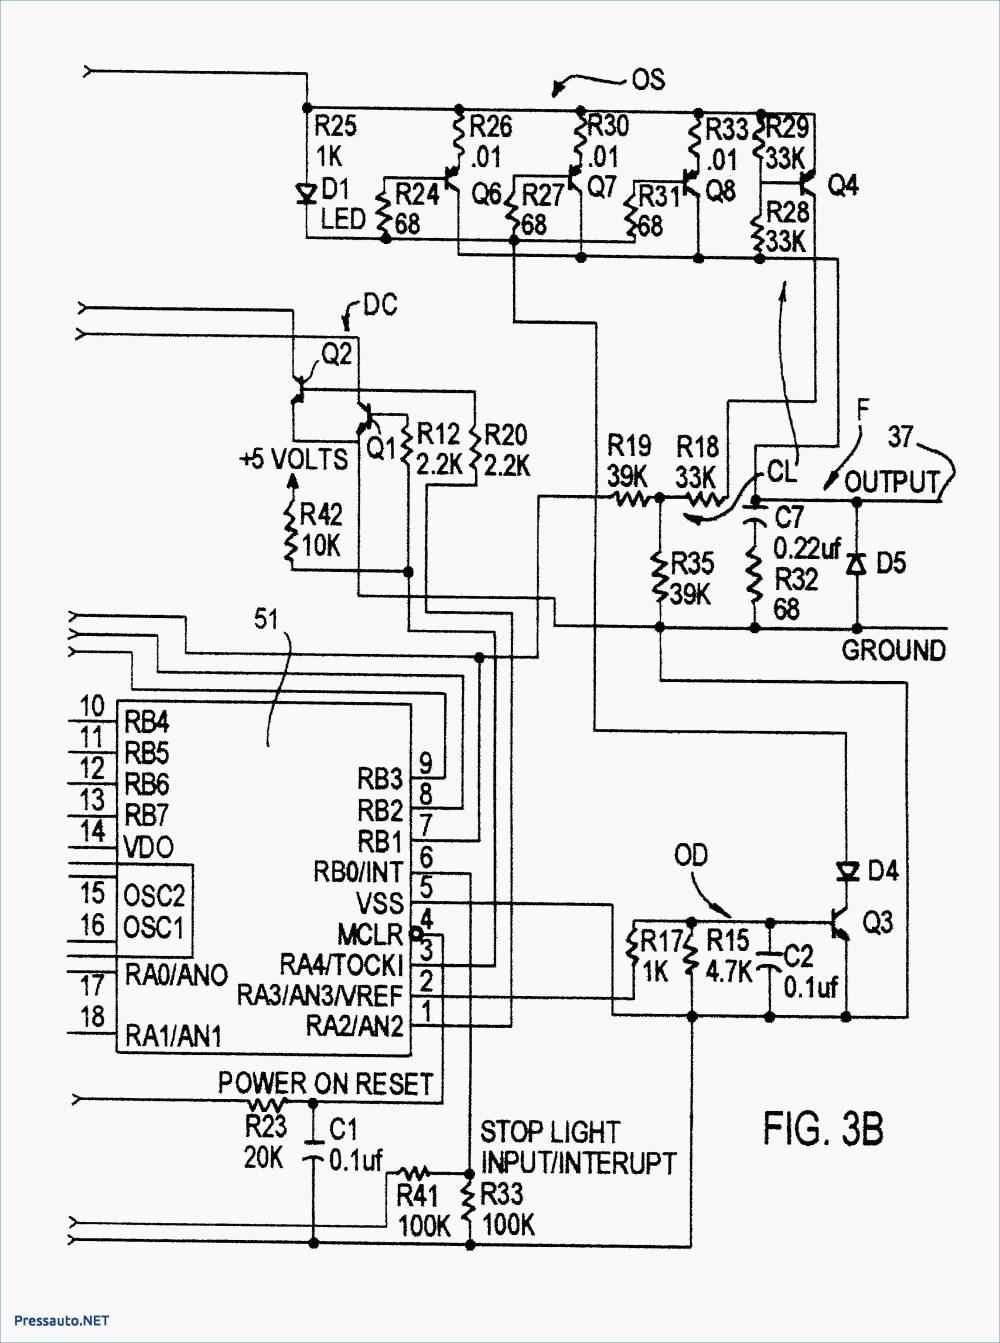 medium resolution of wiring diagram lincoln sa 200 welder wiring librarymarvelous millermatic 211 wiring diagram gallery best wire home